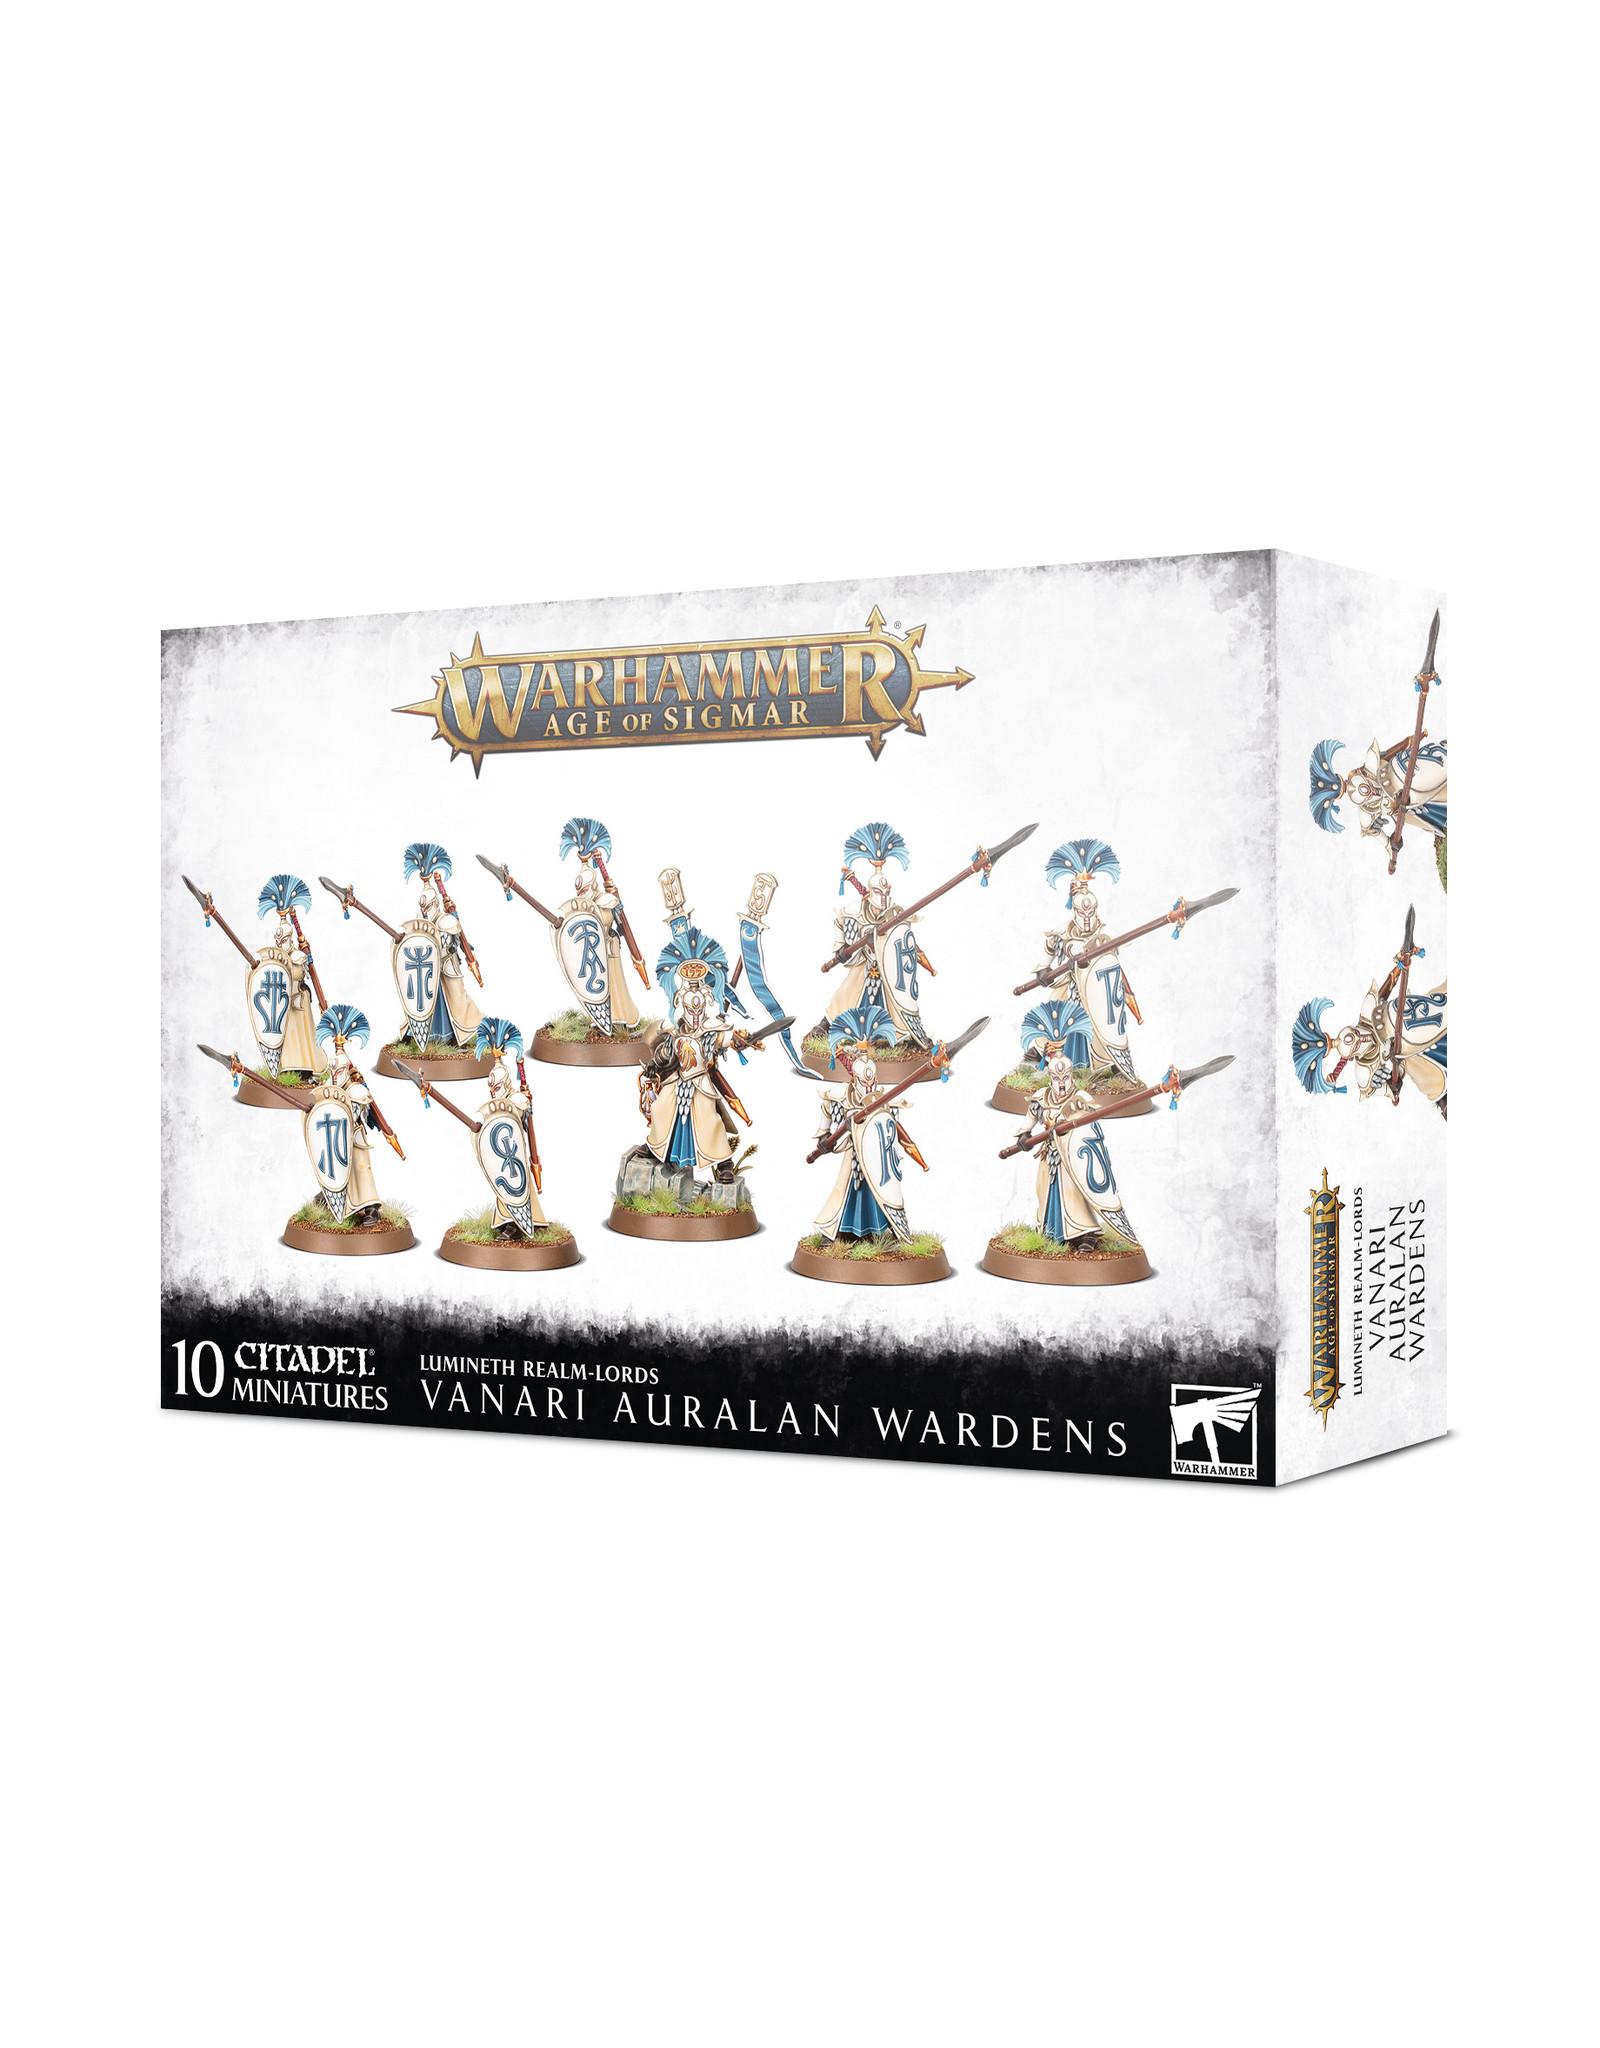 Age of Sigmar Lumineth Realm-Lords: Vanari Auralan Wardens